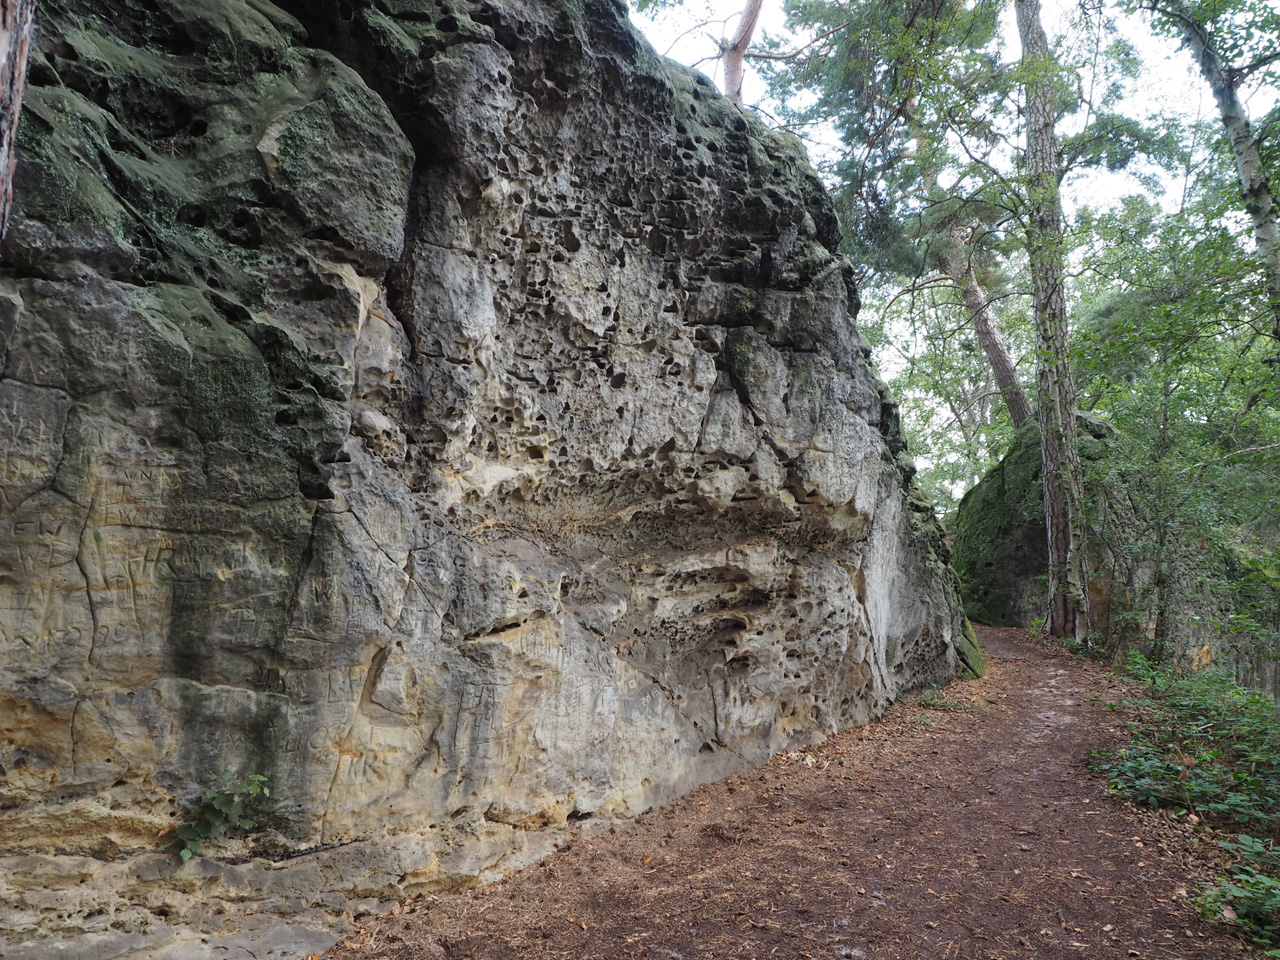 afdaling na de steile rotswand